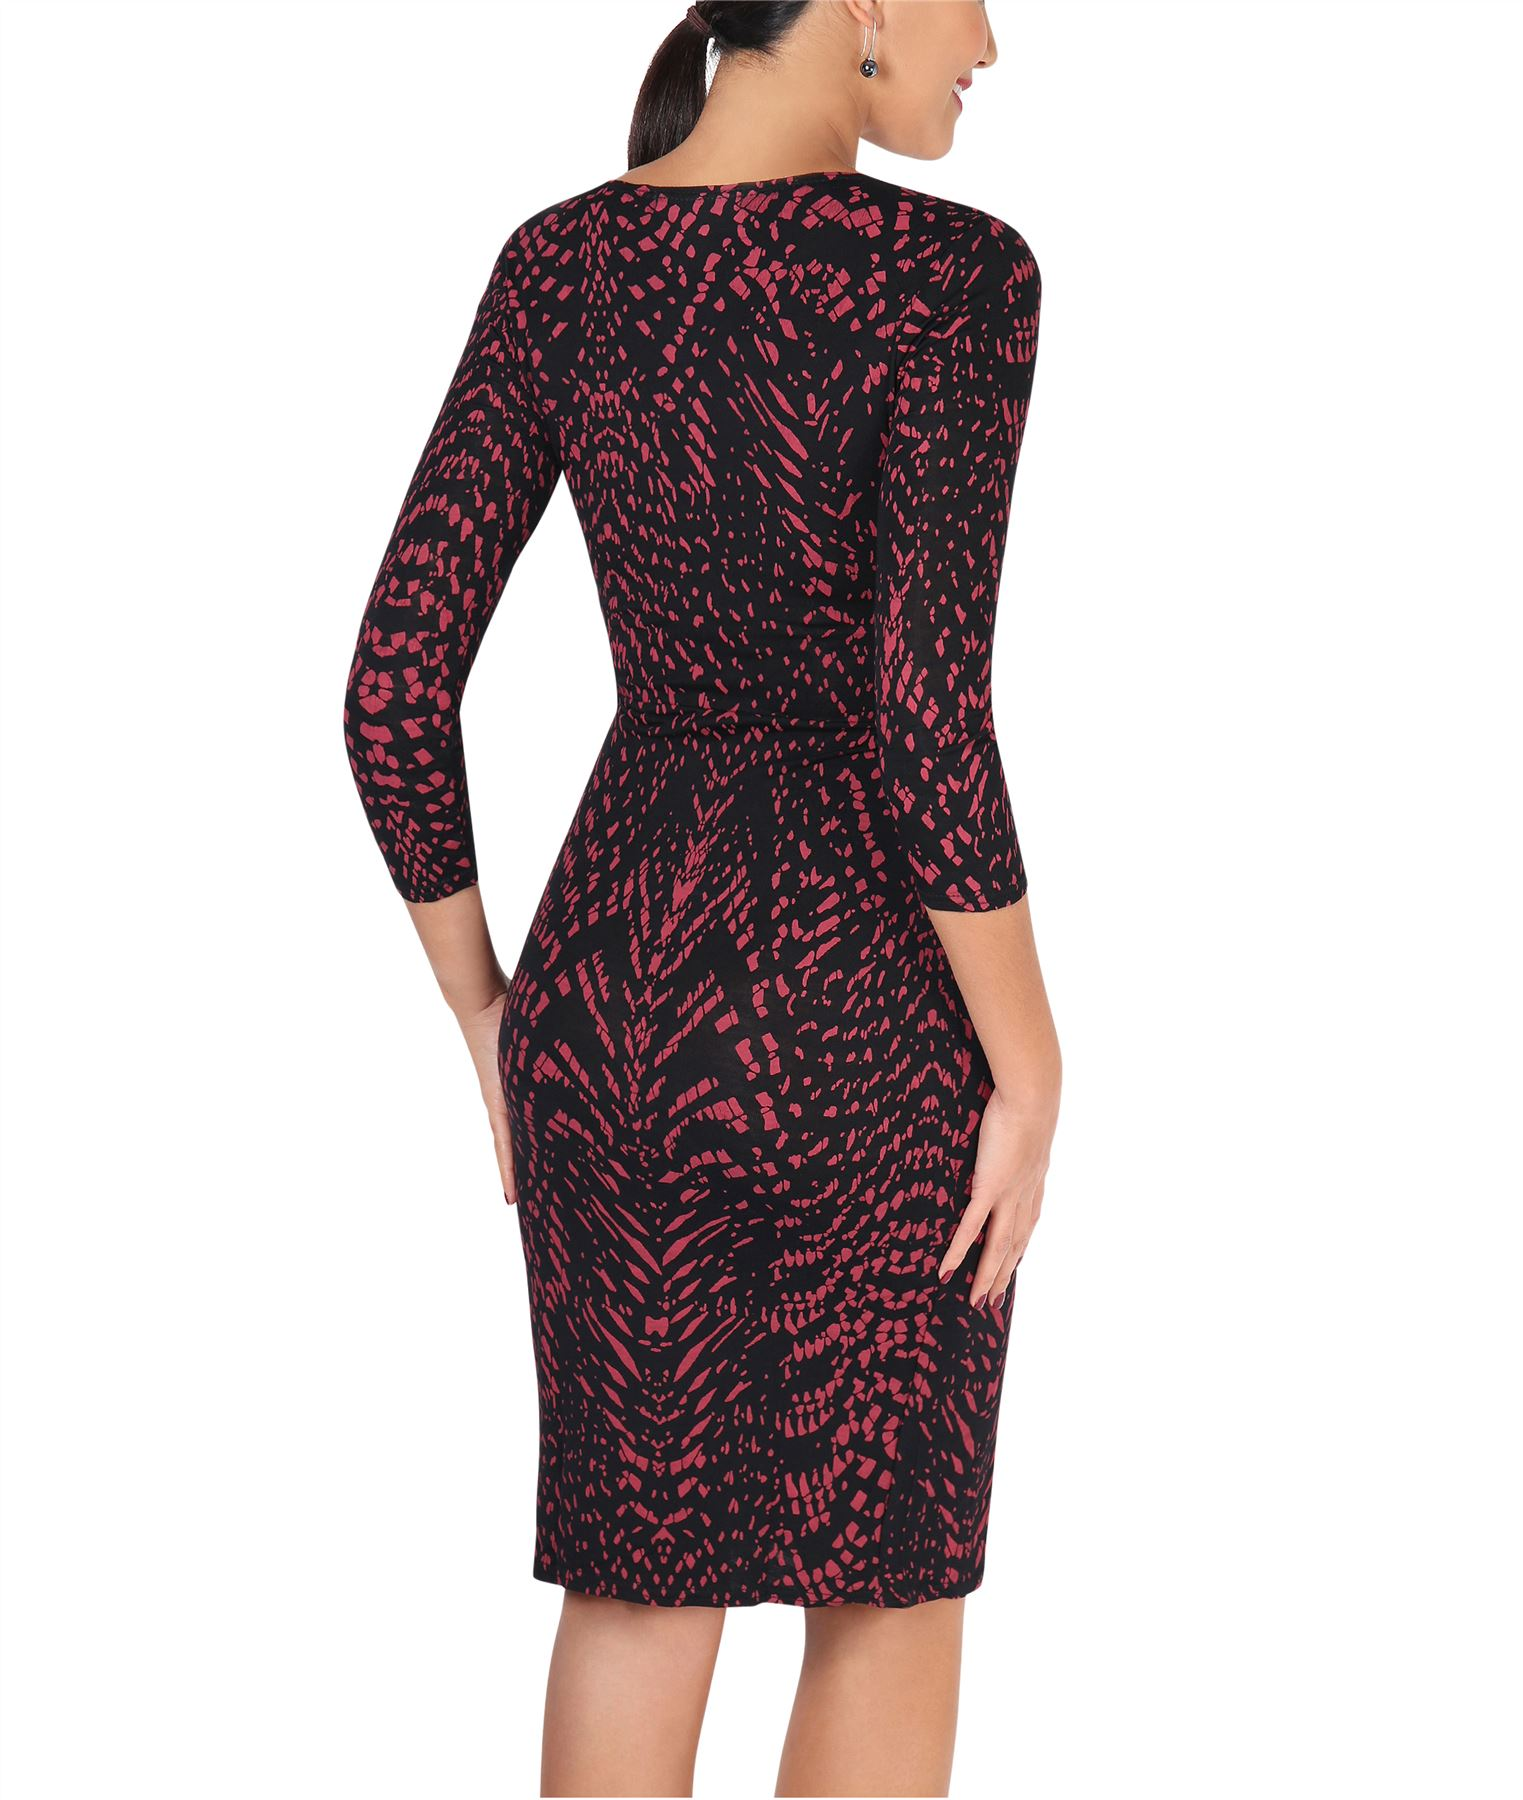 Womens-V-Neck-Dress-Top-Bodycon-Skirt-Midi-Snakeskin-Print-Cross-Over-Party-Wrap thumbnail 25